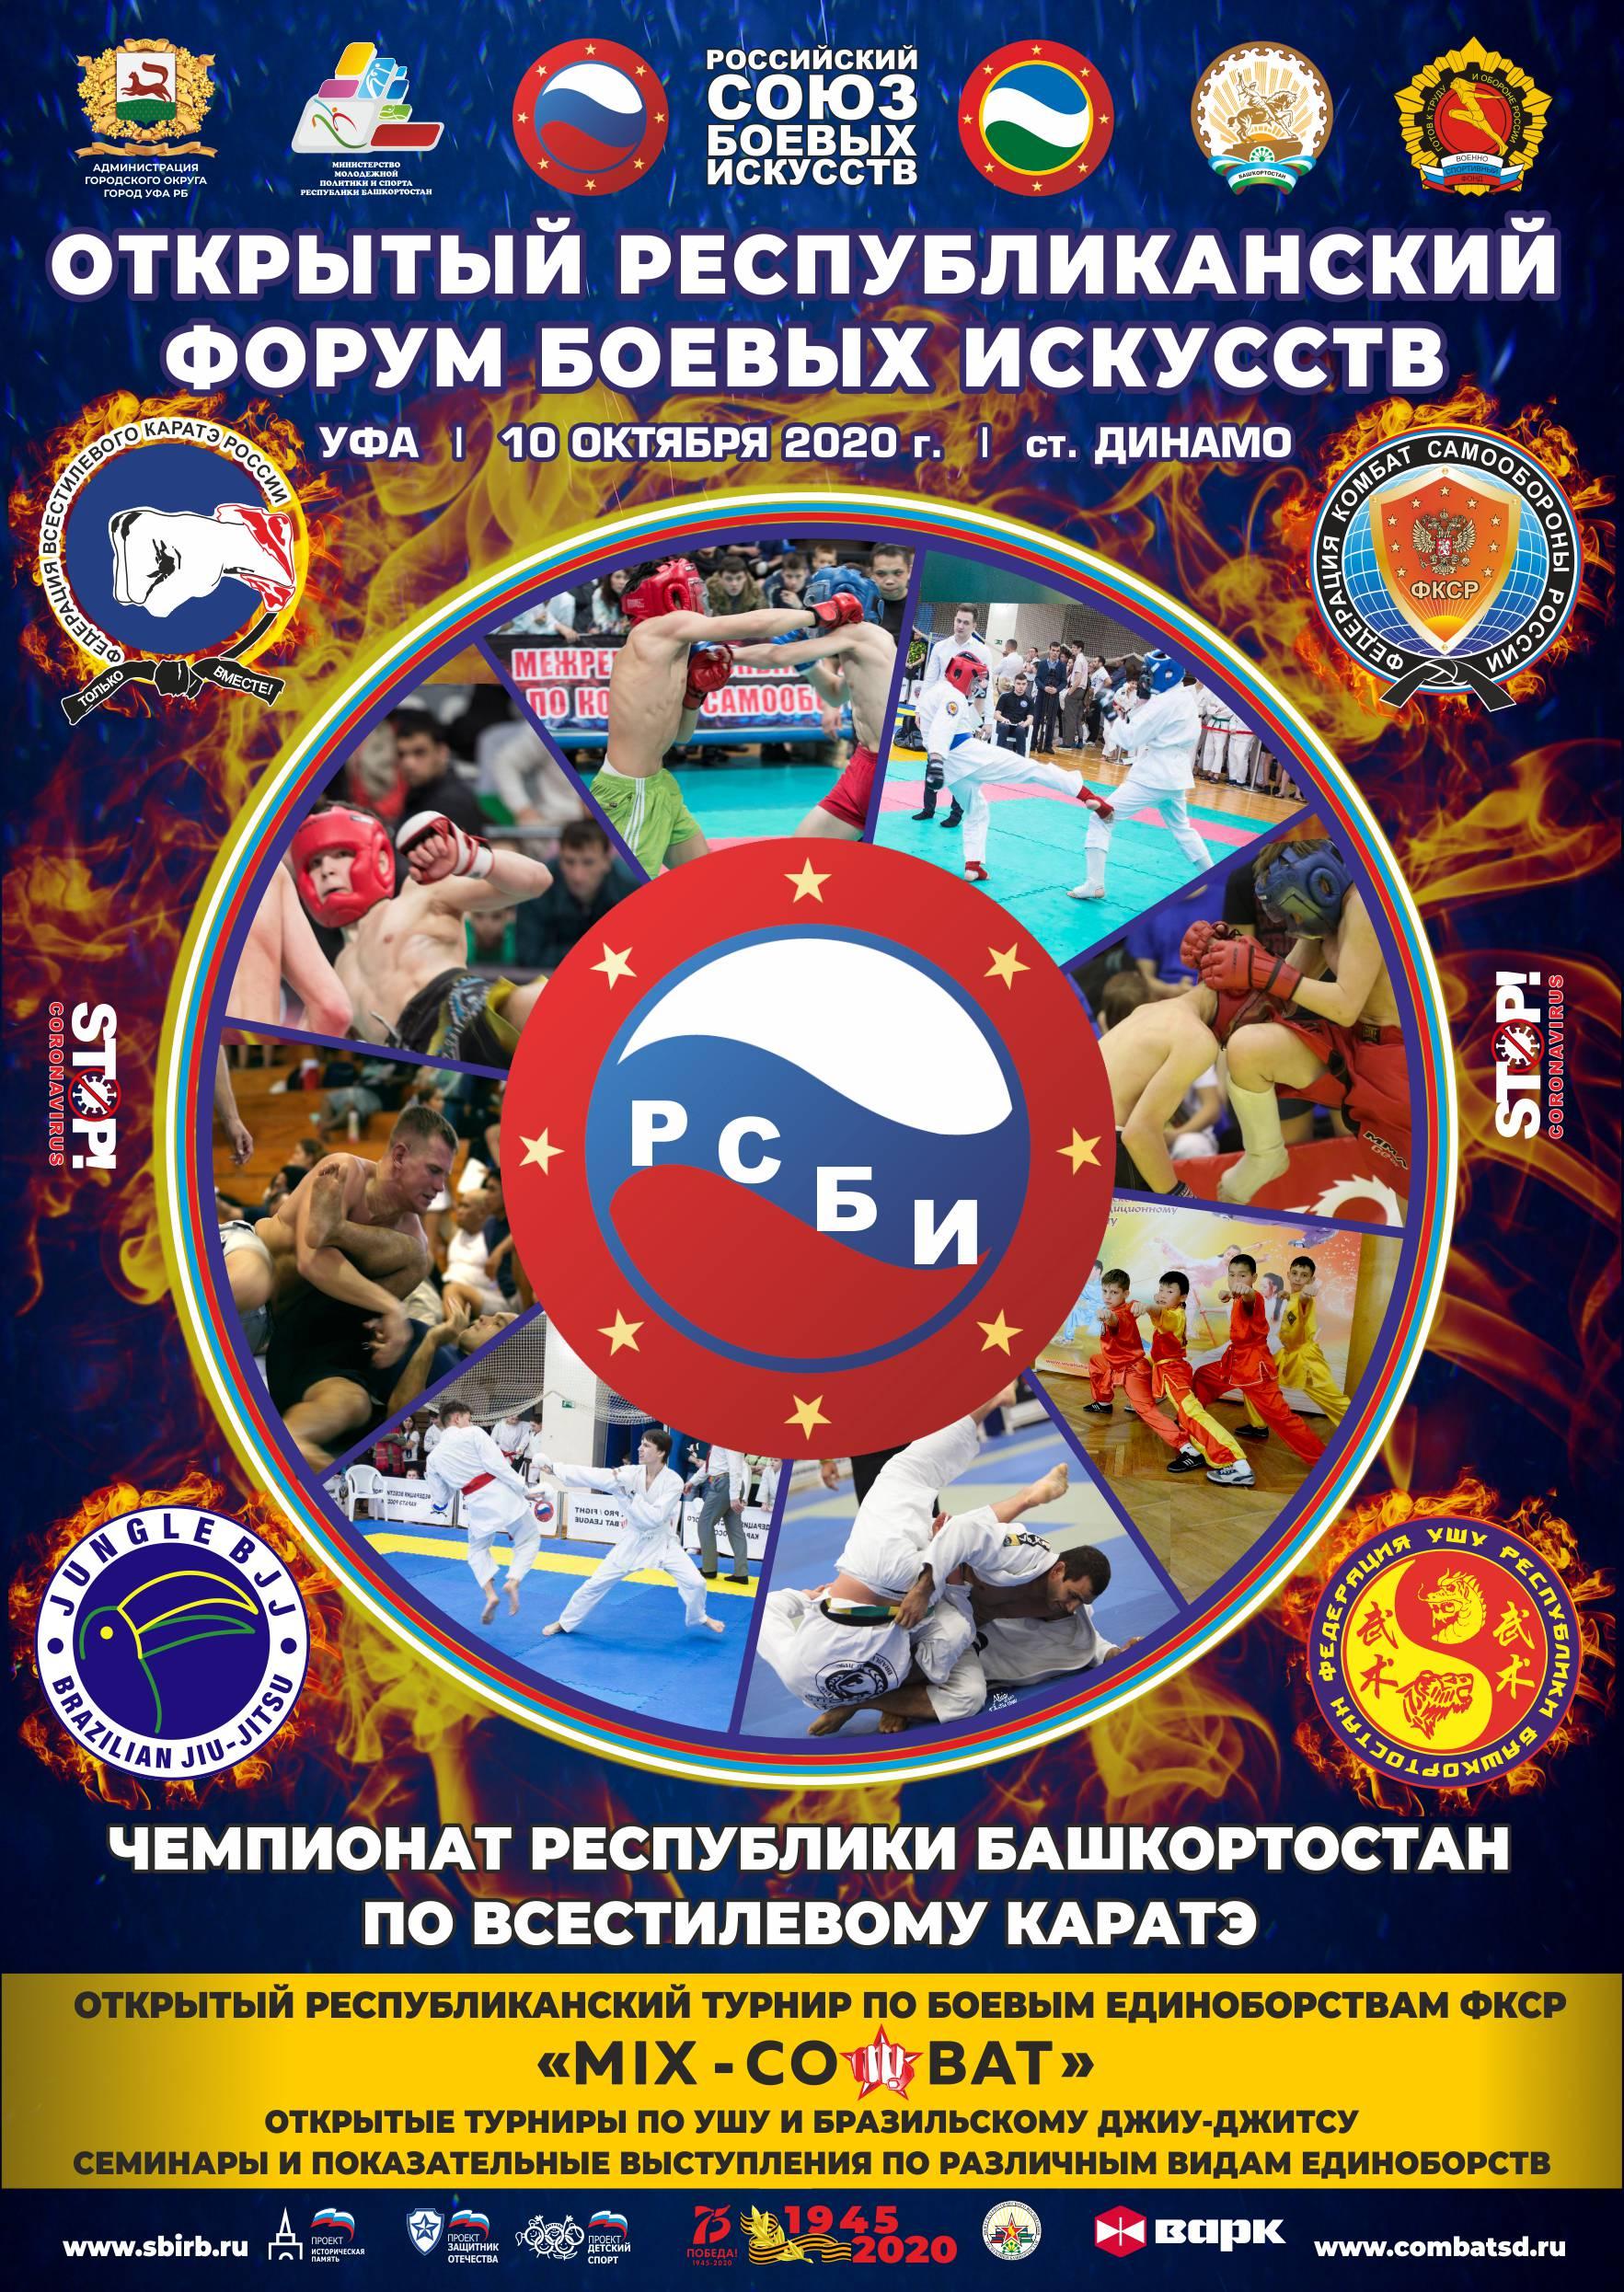 http://sbirb.combatsd.ru/images/upload/Афиша%20октябрь.jpg